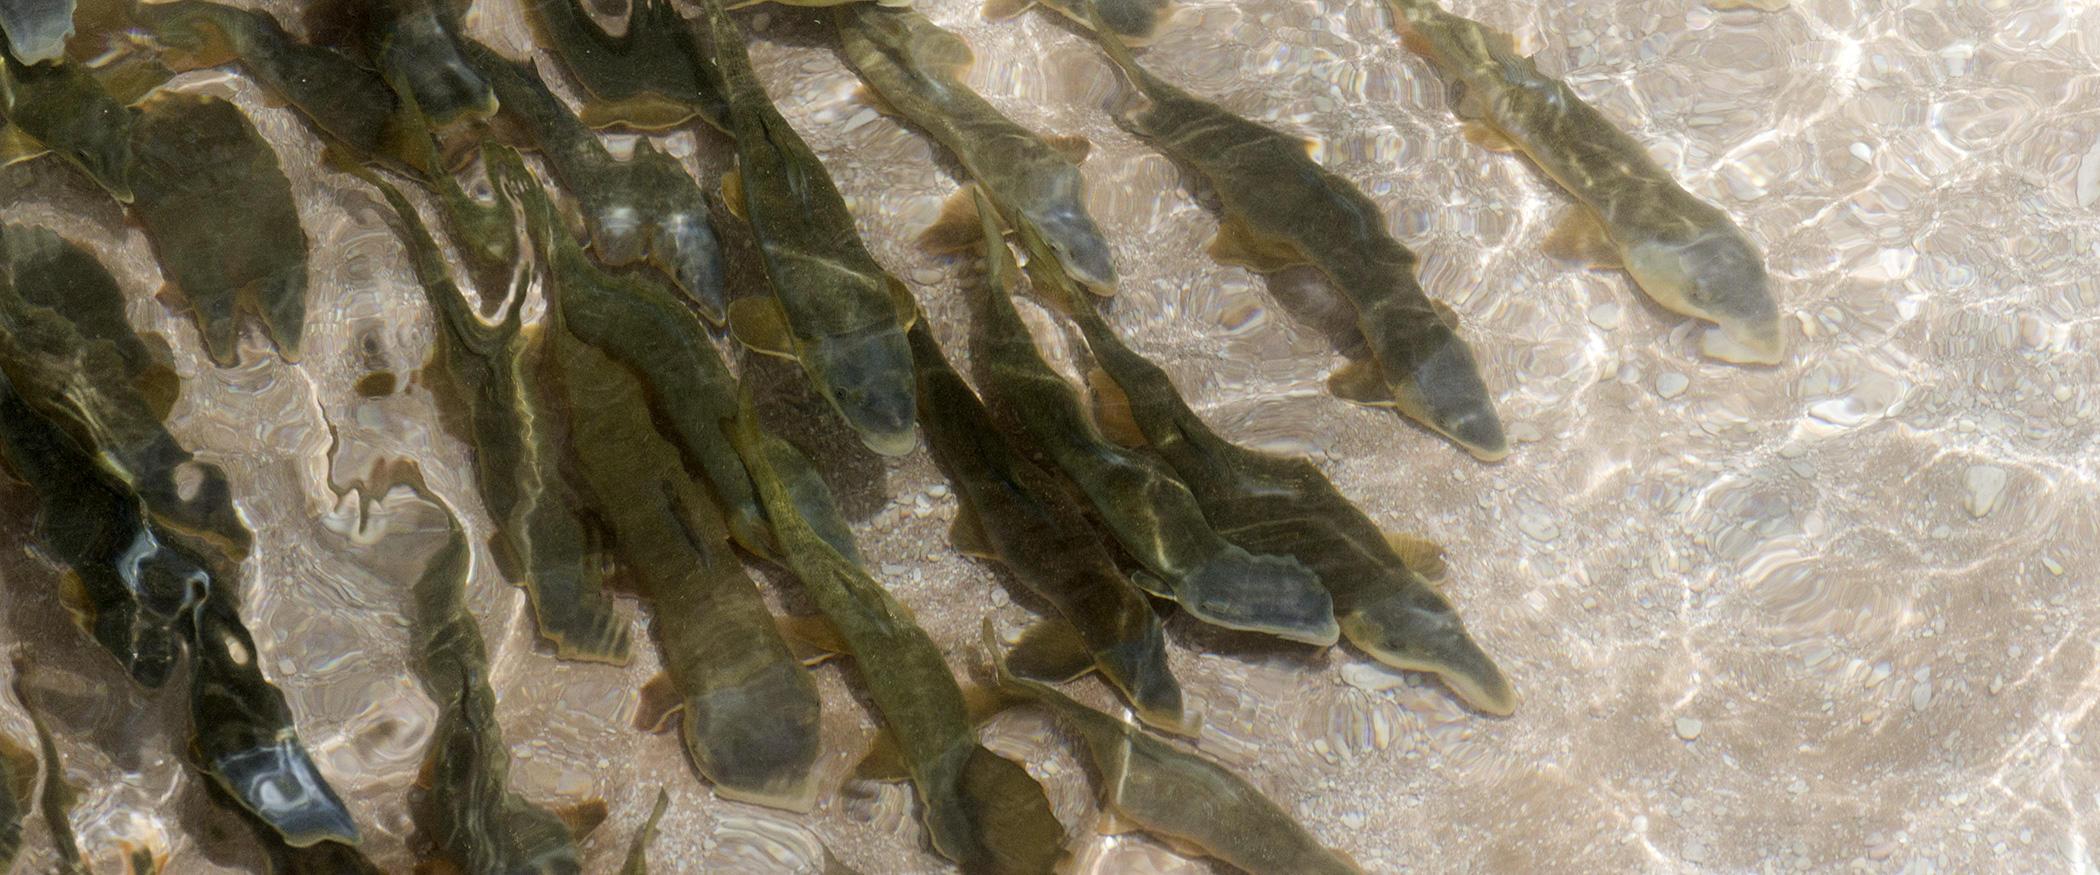 Colorado River Fish Audubon Rockies